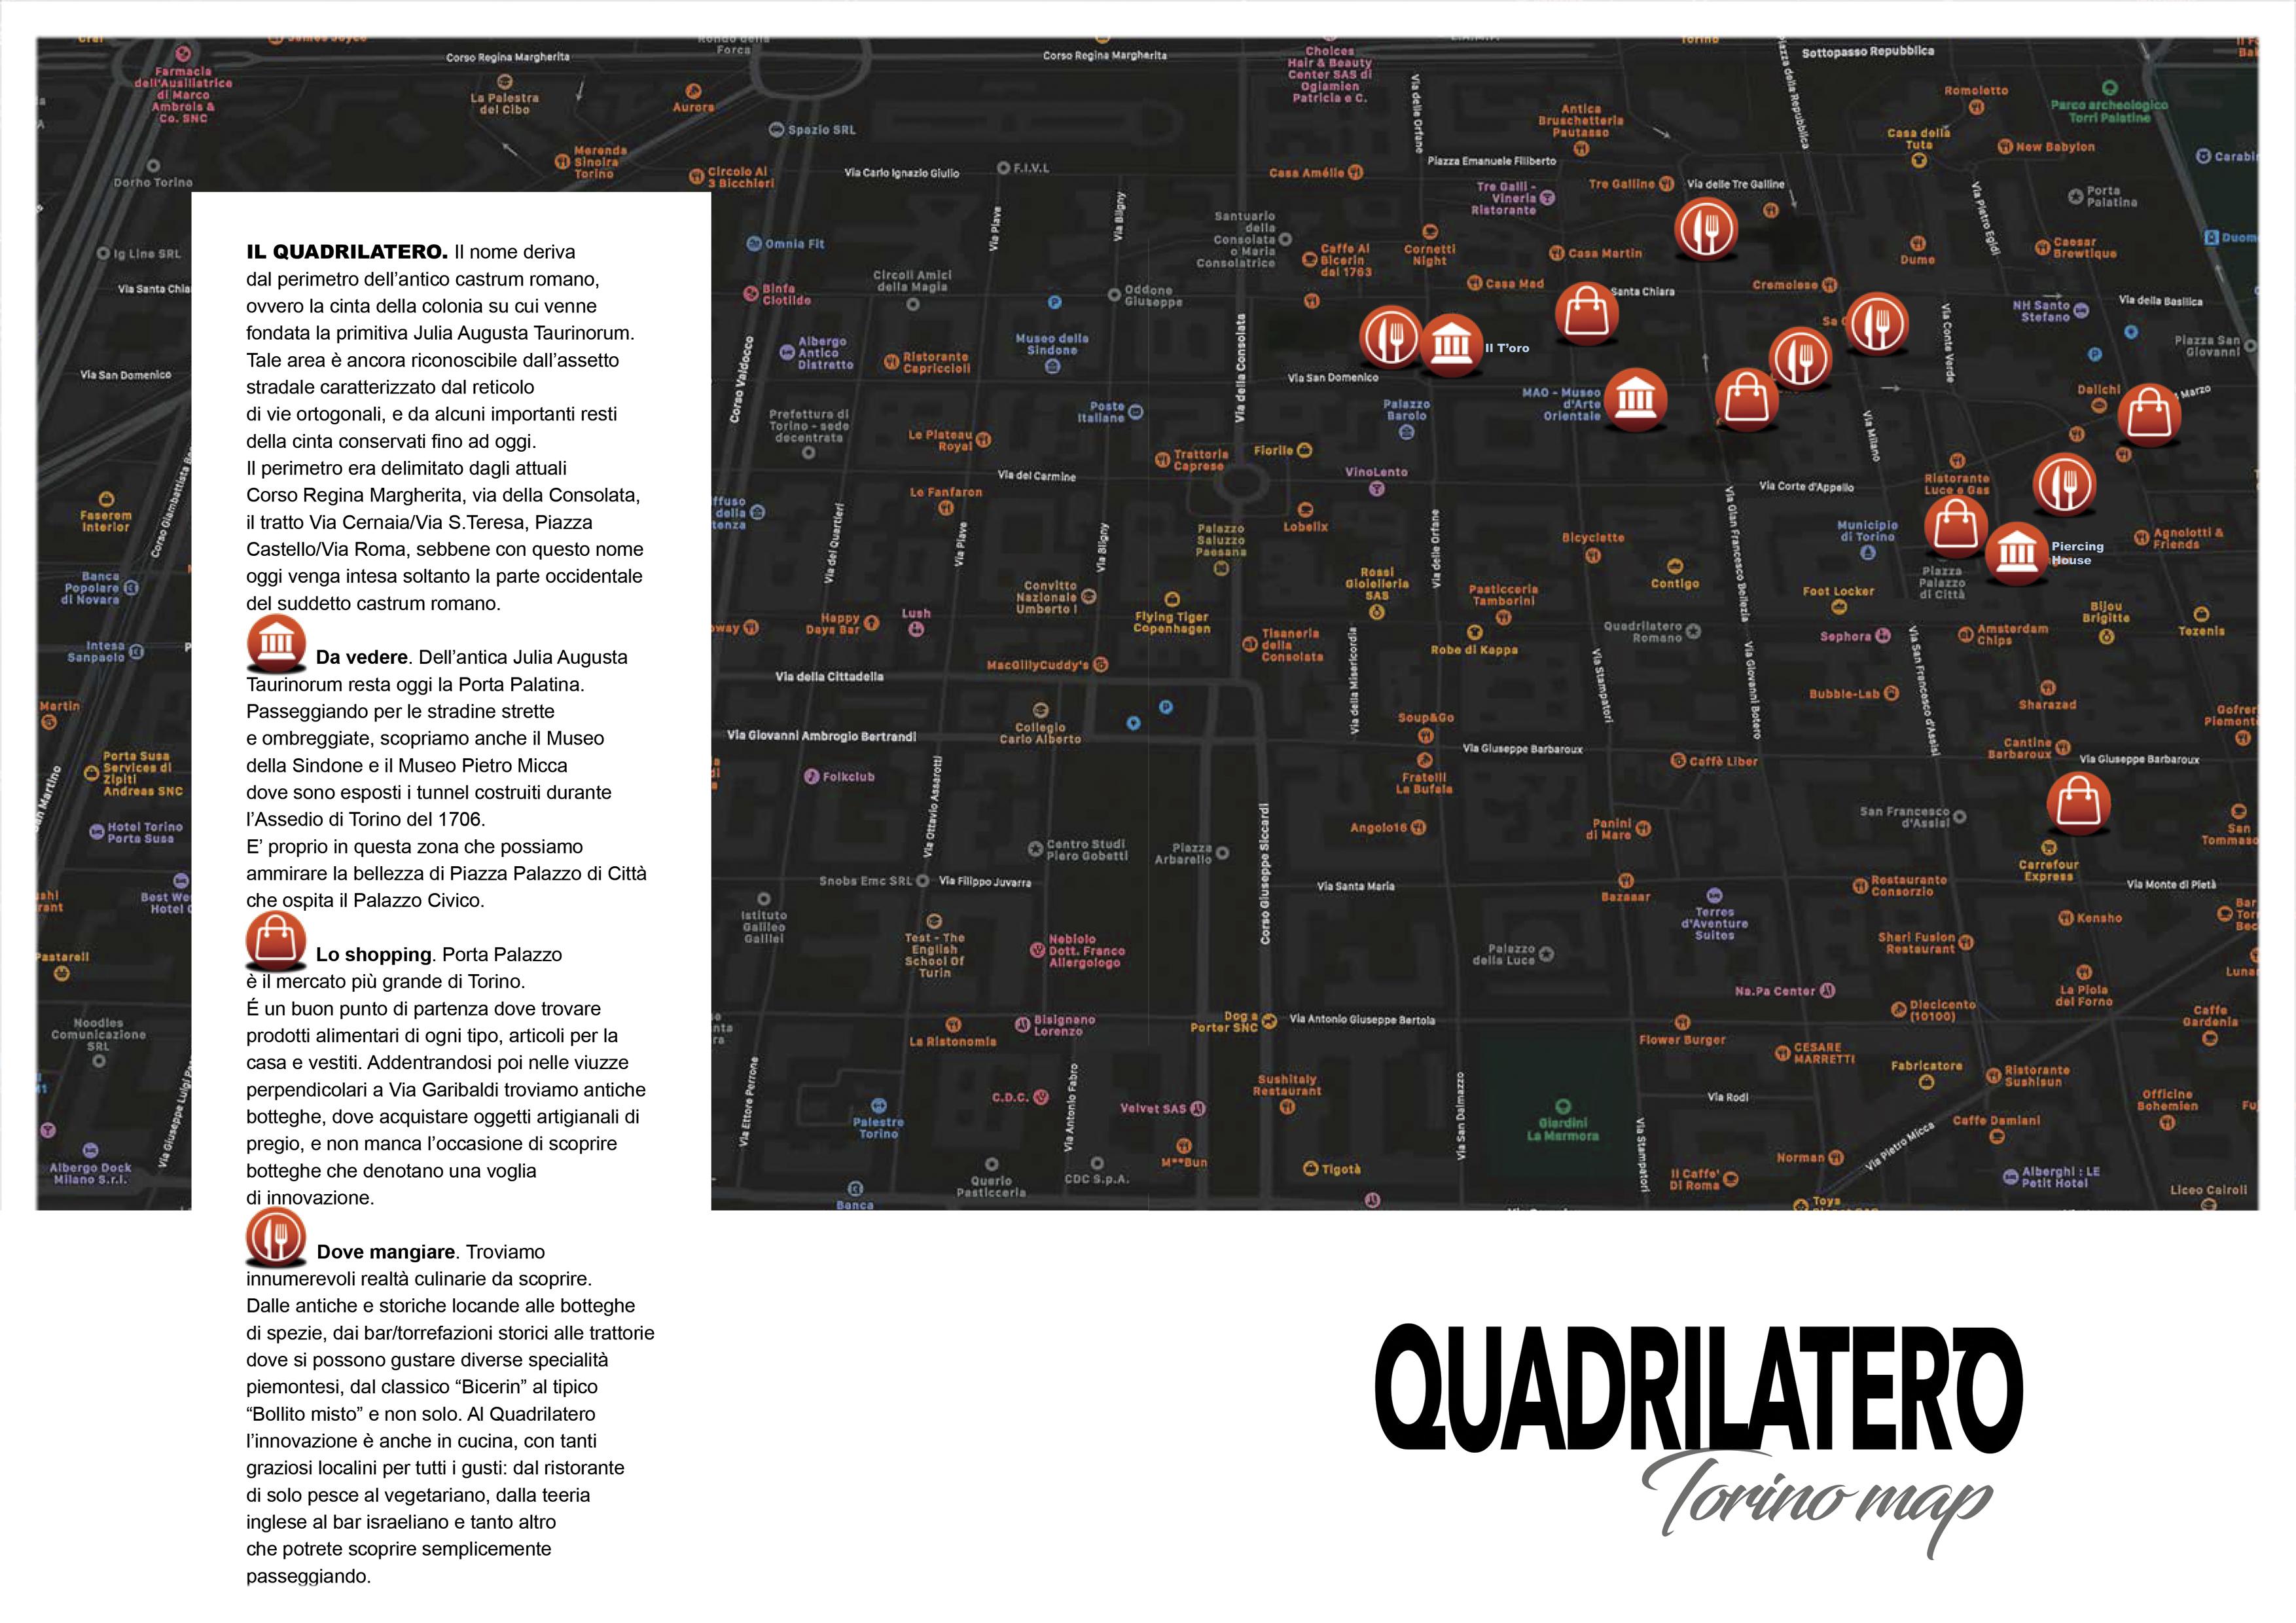 QUADRILATERO TORINO map